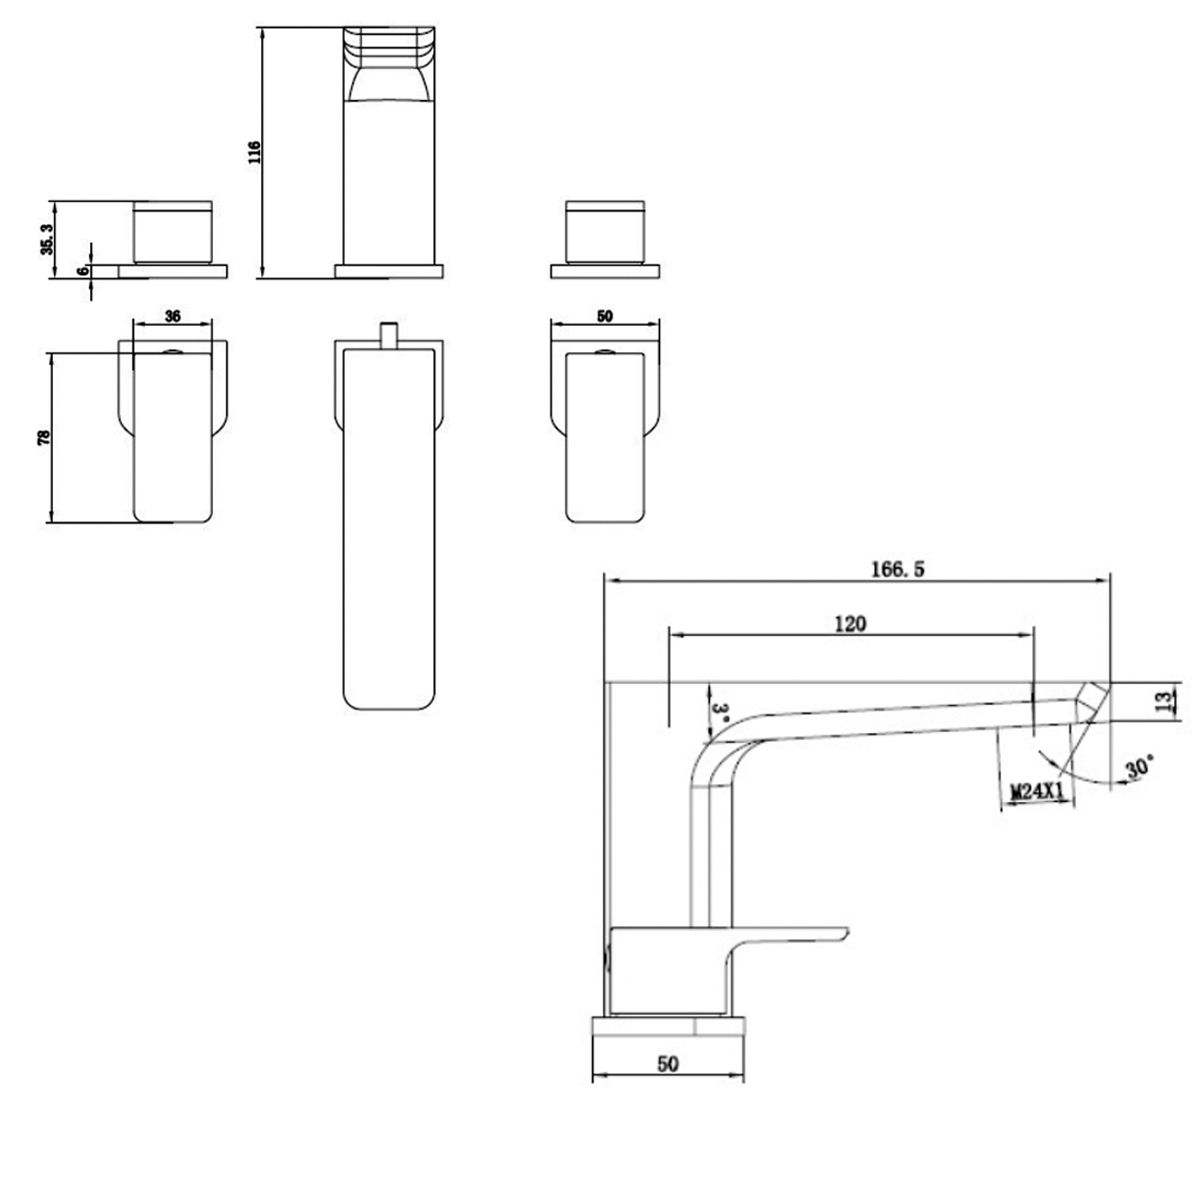 RAK Moon Deck Mounted 3 Hole Bath Filler Tap Measurements